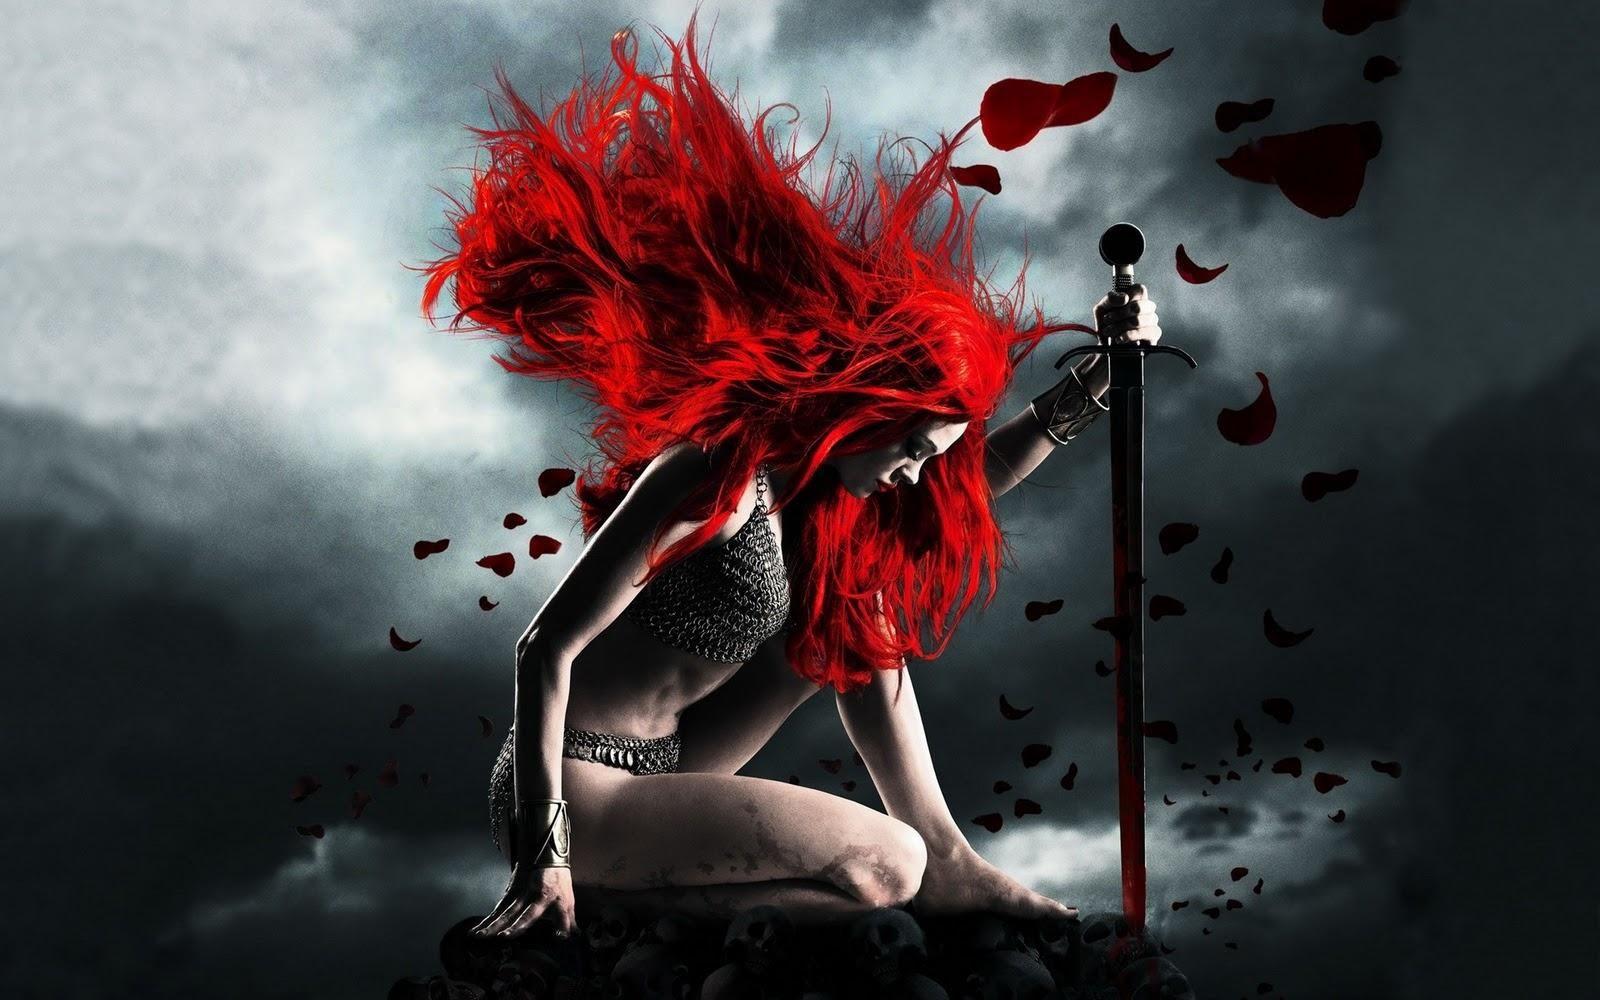 Powerful Women Red Sonja Warriors Wallpaper Red Sonja Movie